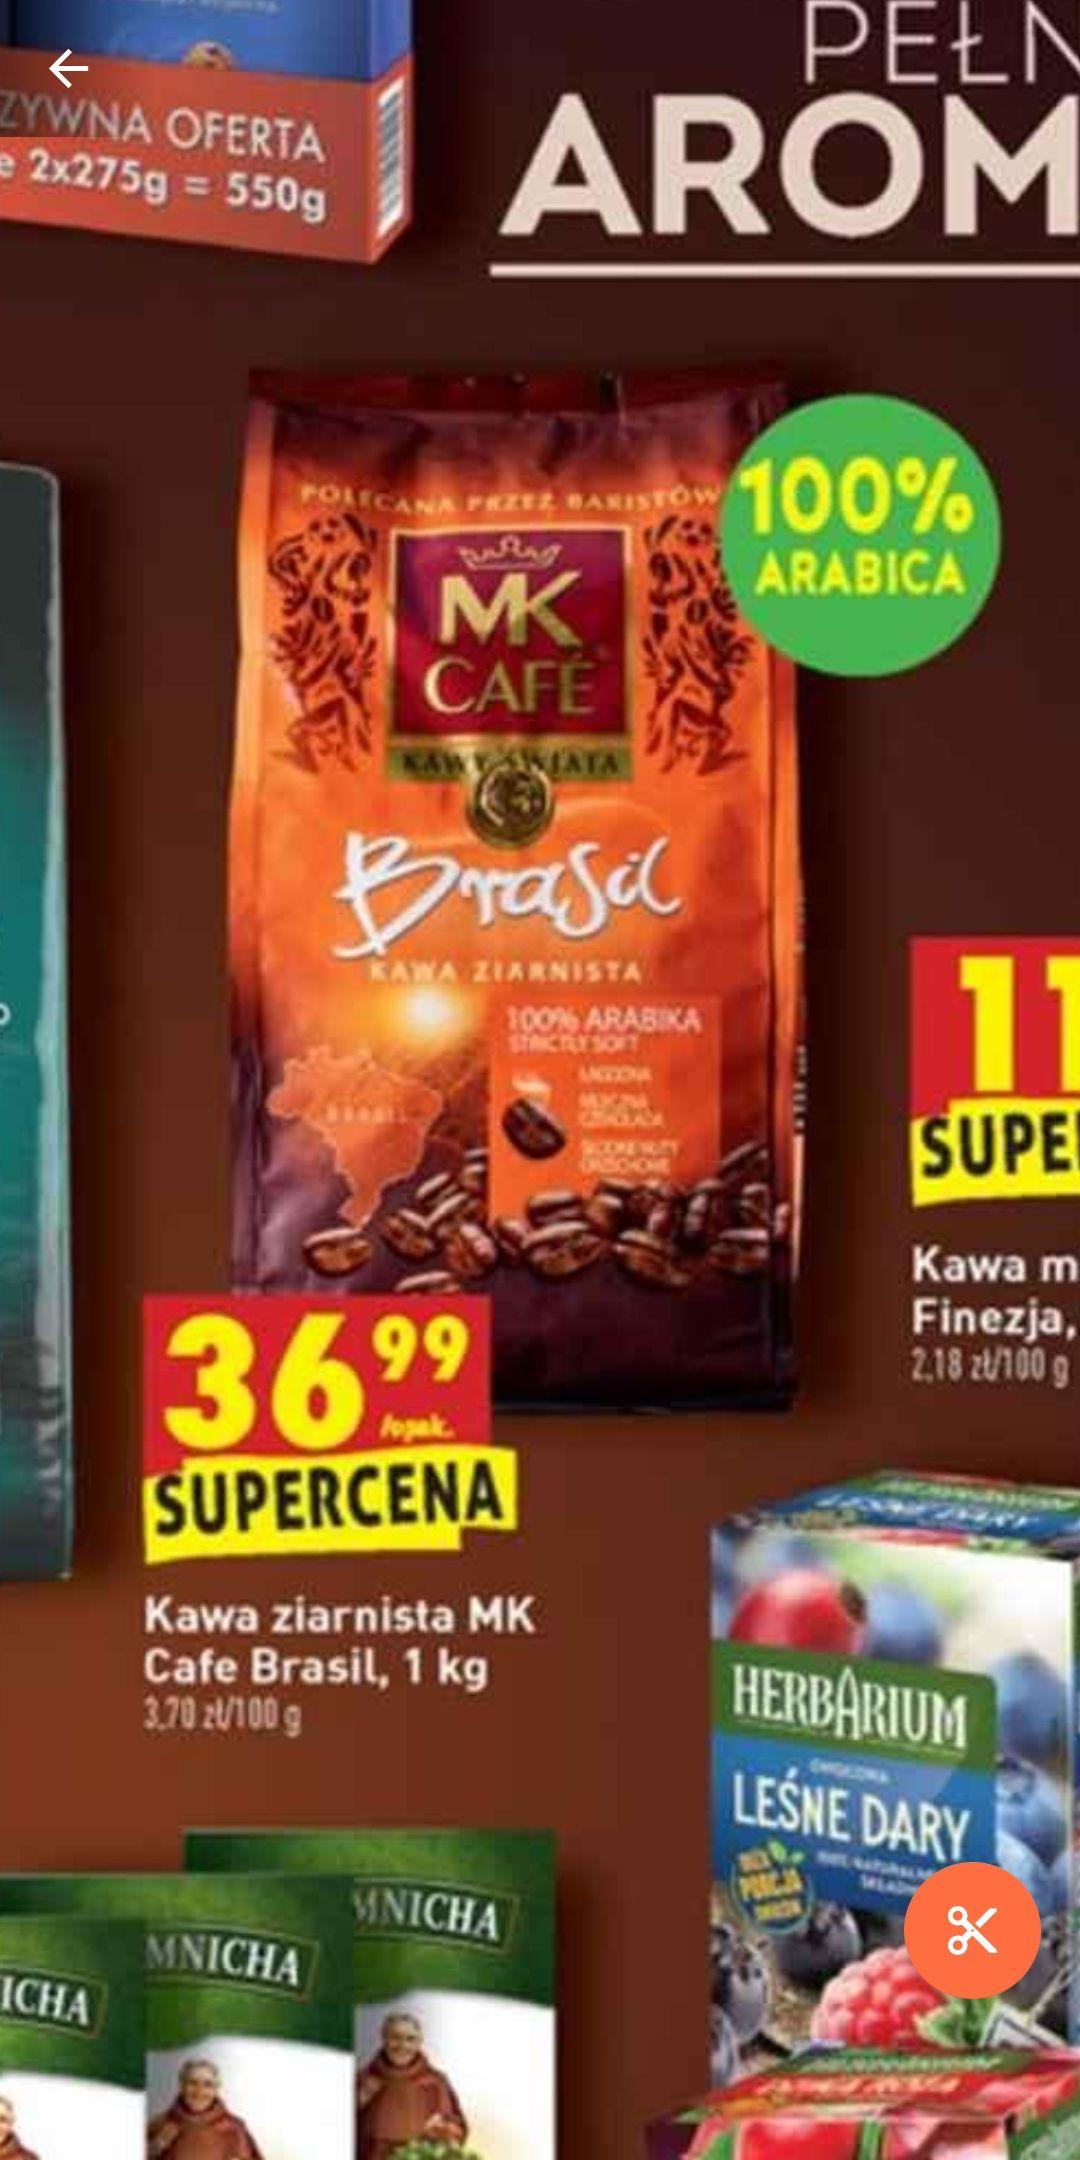 Kawa Mk Cafe Brasil